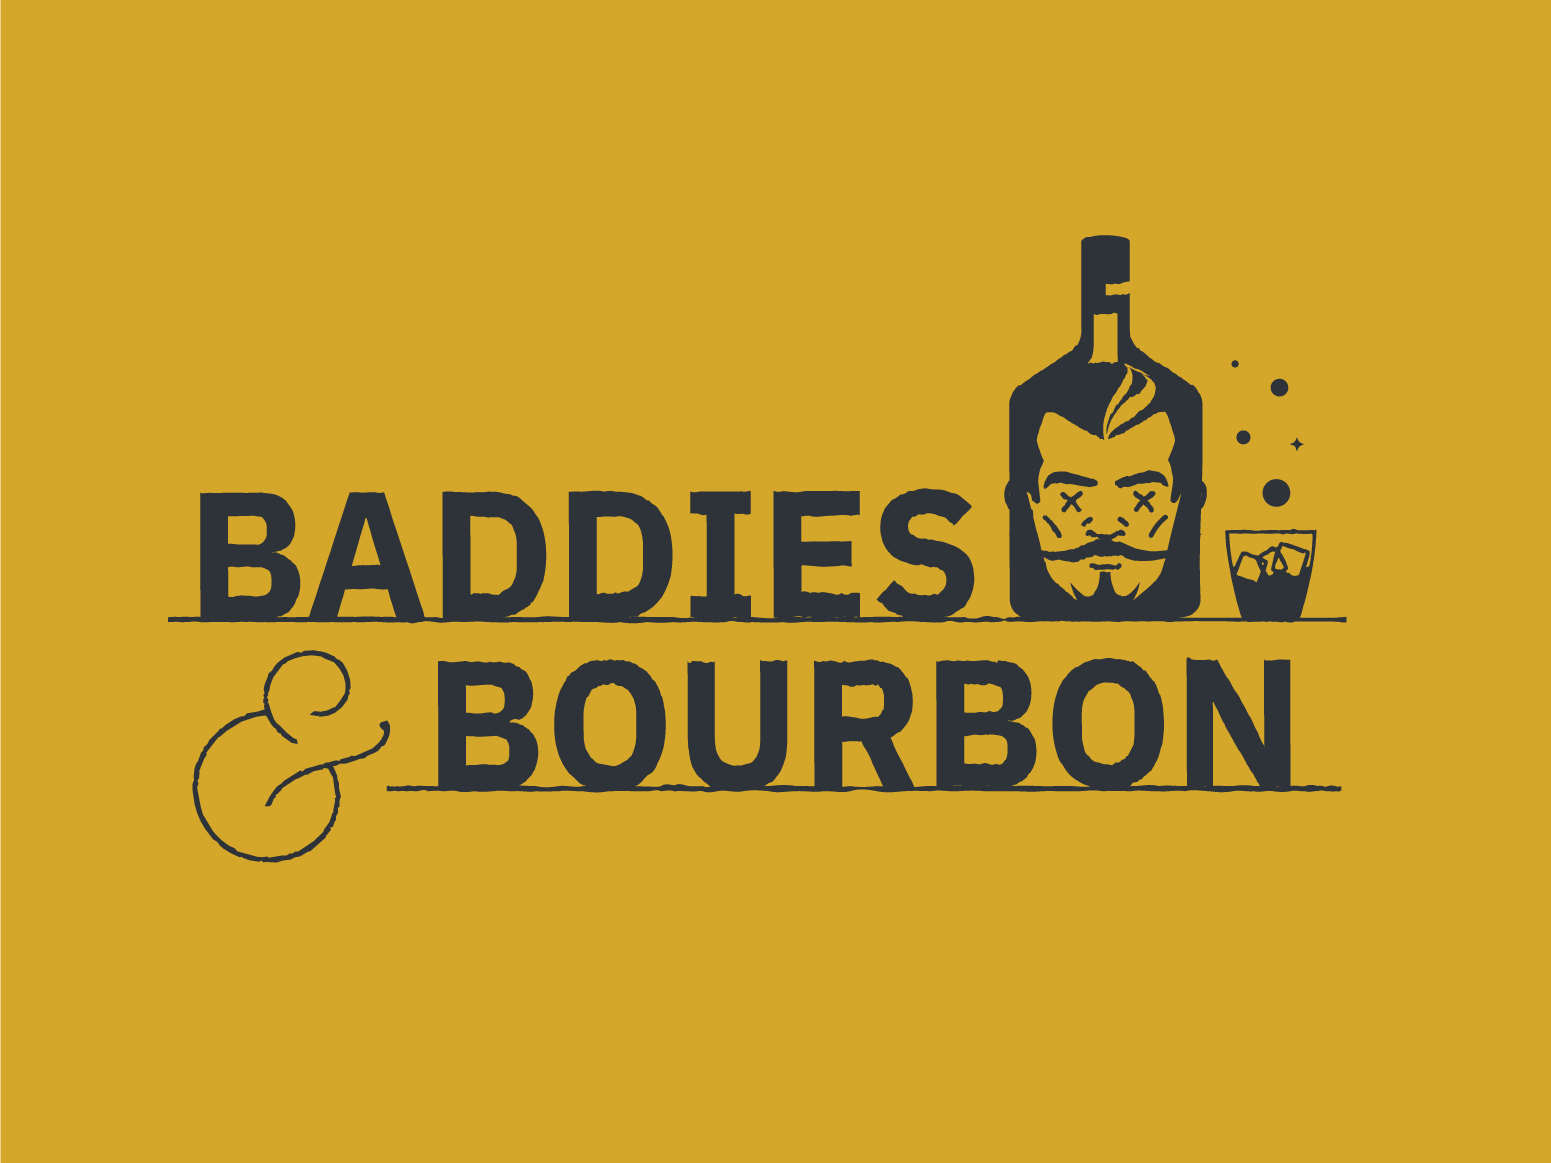 Baddies & Bourbon movies villains bourbon alcohol design illustration branding logo